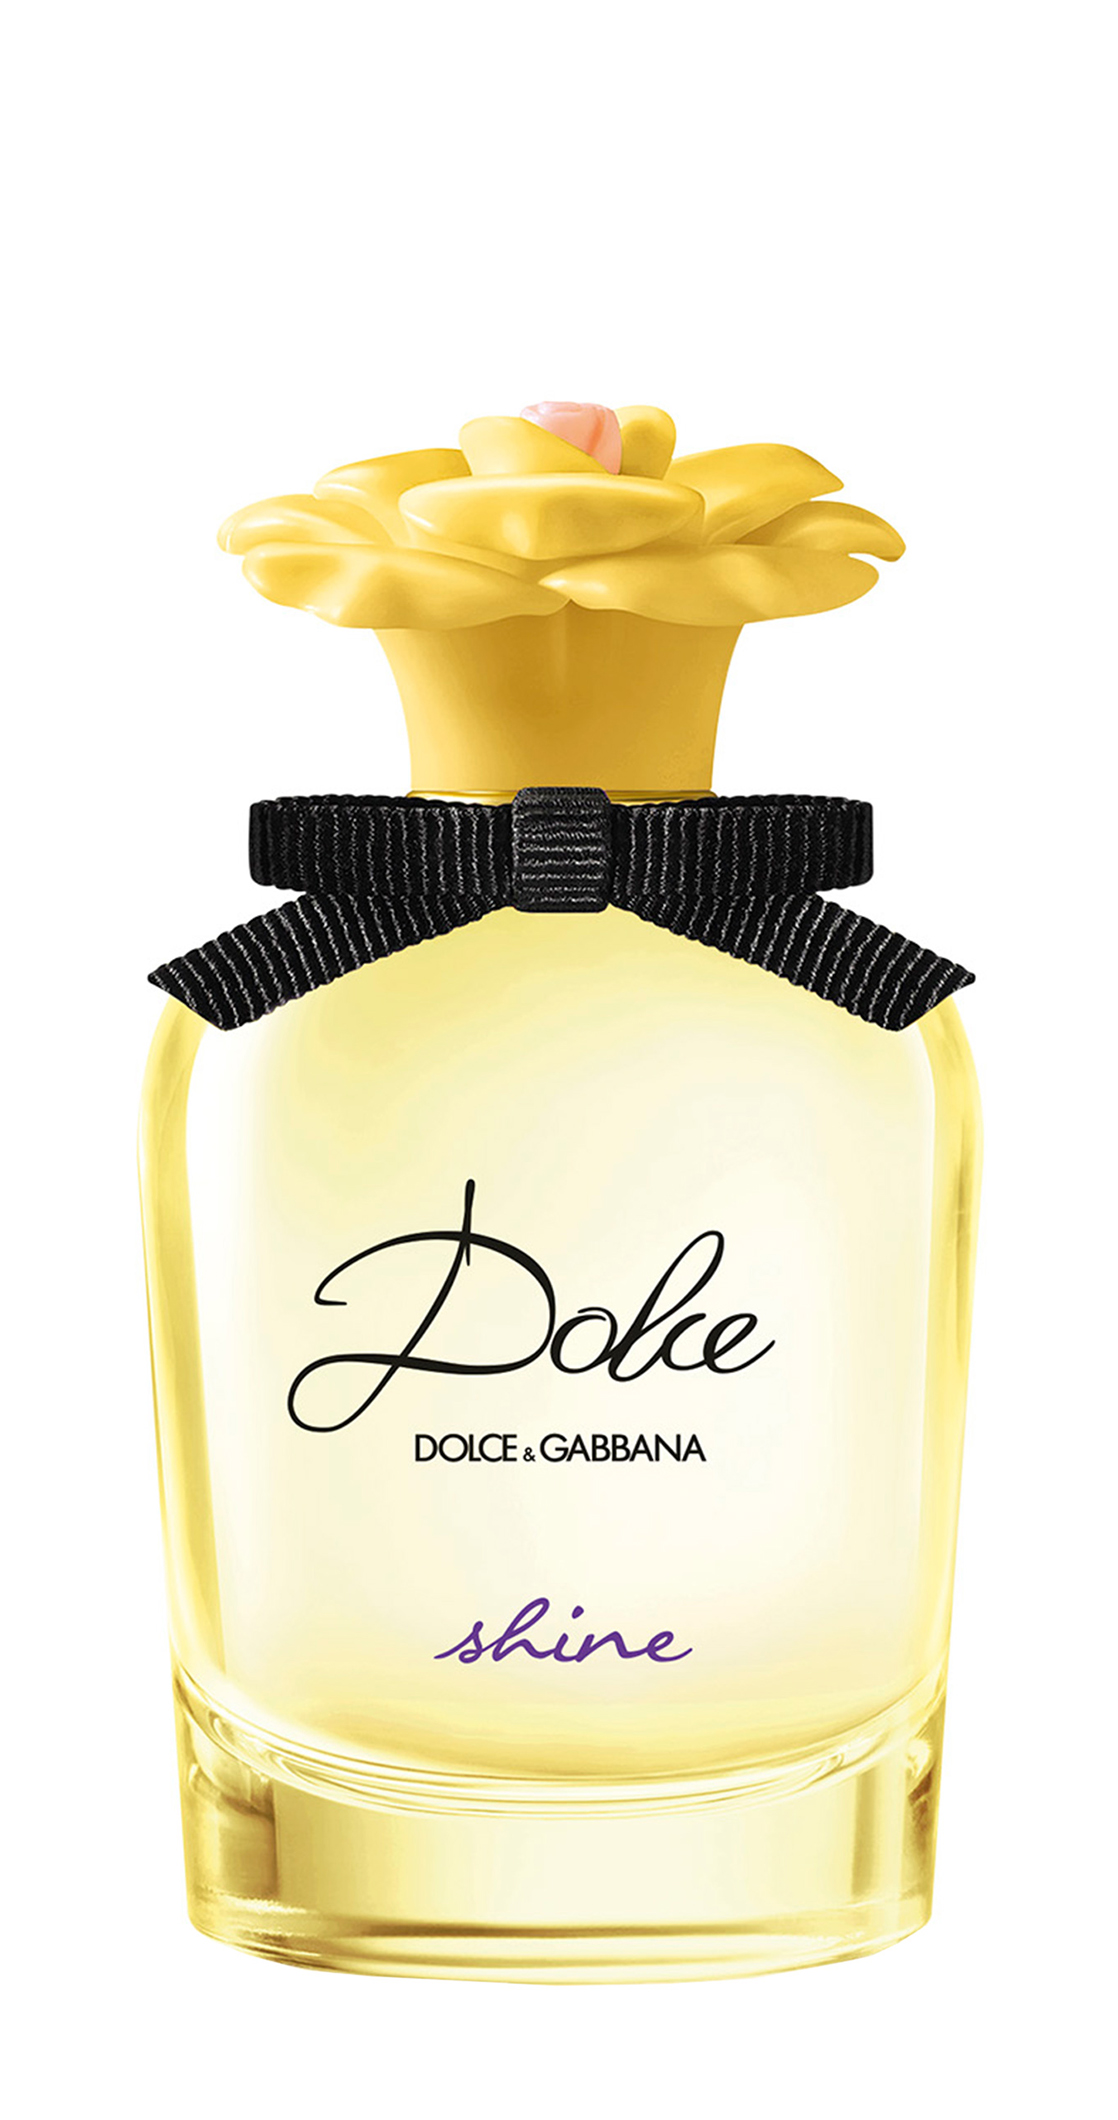 Купить Парфюмерная вода Dolce & Gabbana Dolce Shine Eau De Parfum 50 мл, DOLCE&GABBANA